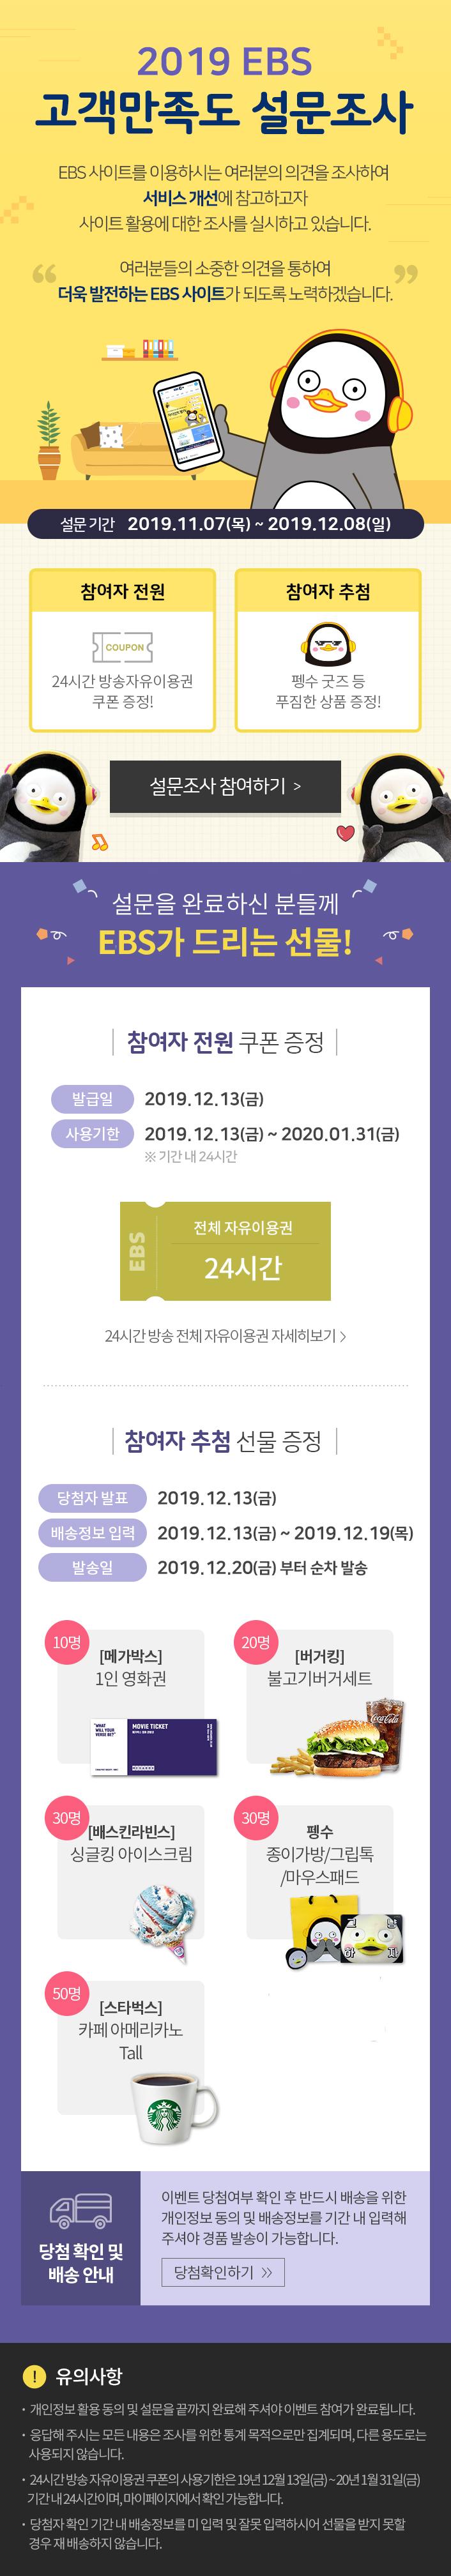 2019 EBS 고객만족도 설문조사